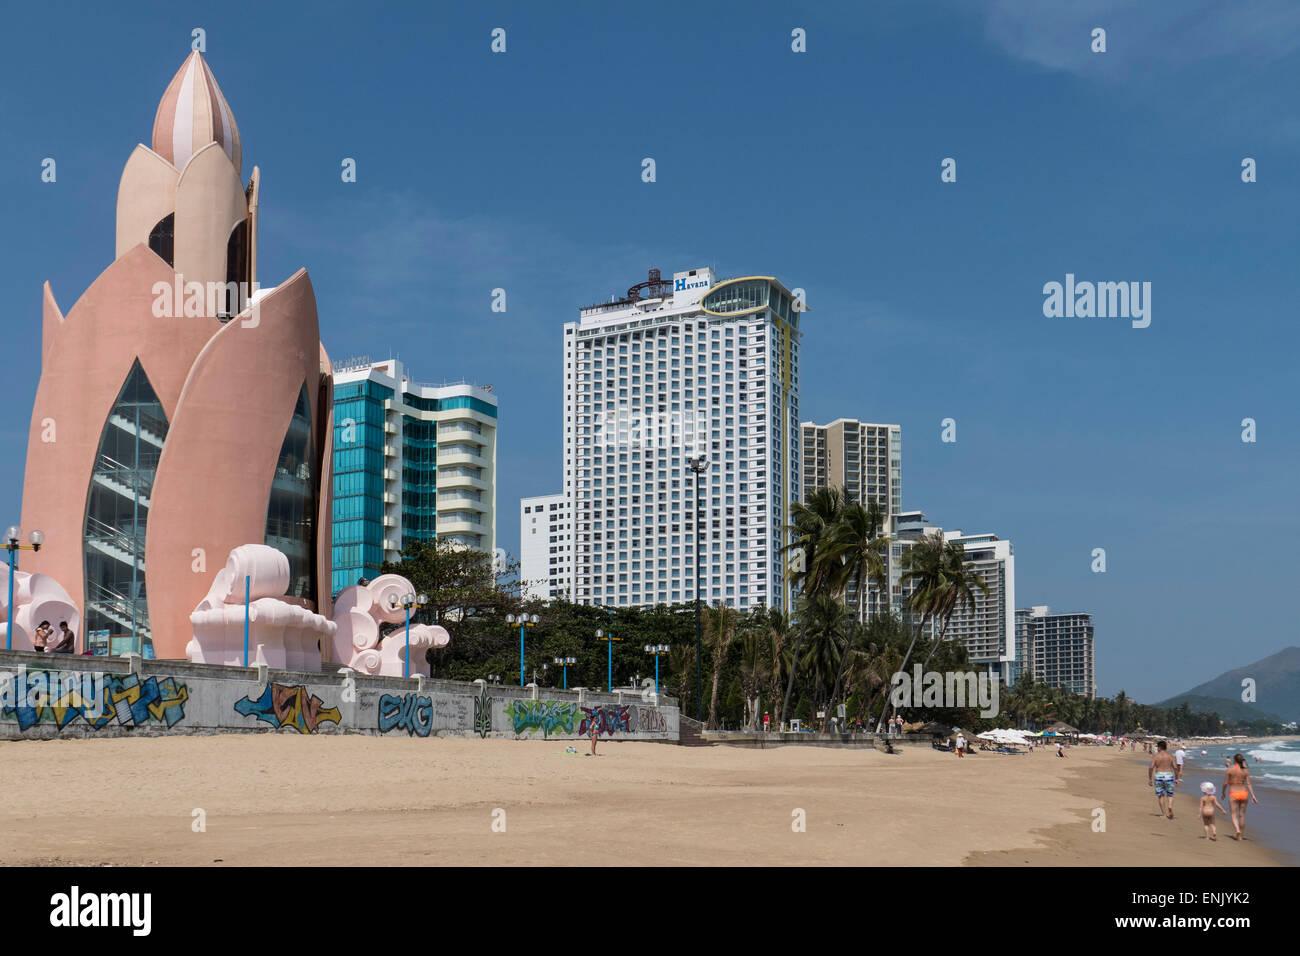 Seafront, Nha Trang, Vietnam, Indochina, Southeast Asia, Asia - Stock Image